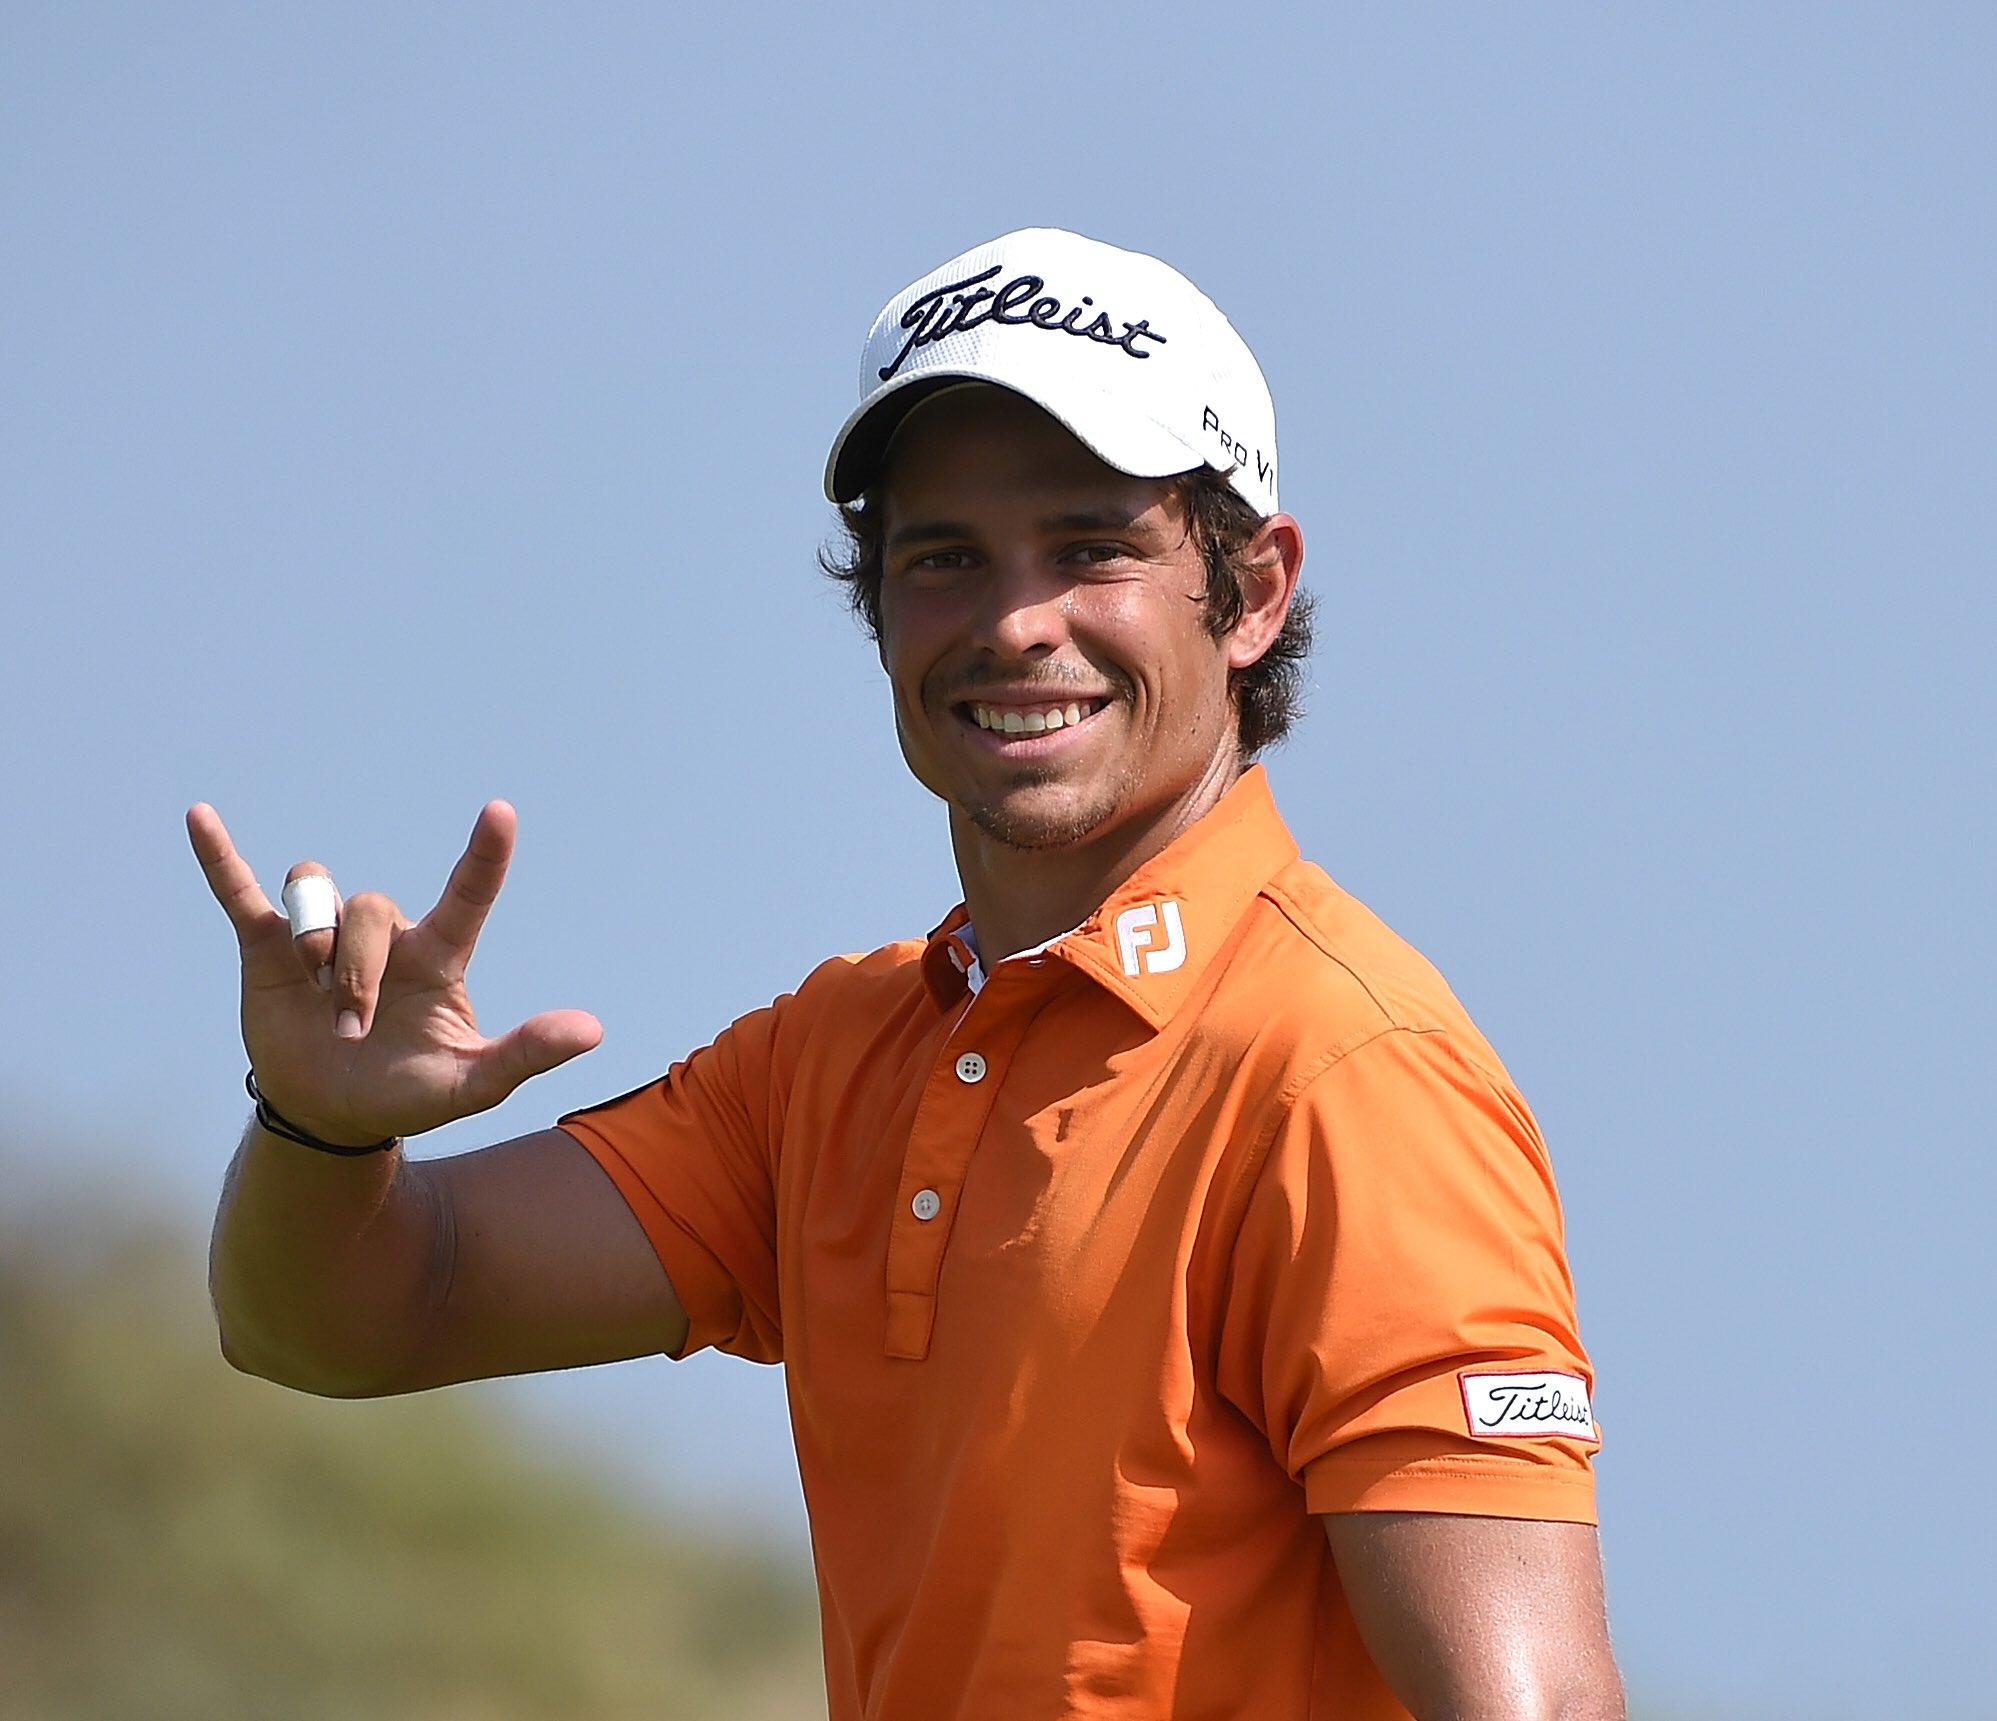 Avatar of golfer named Adrien Saddier